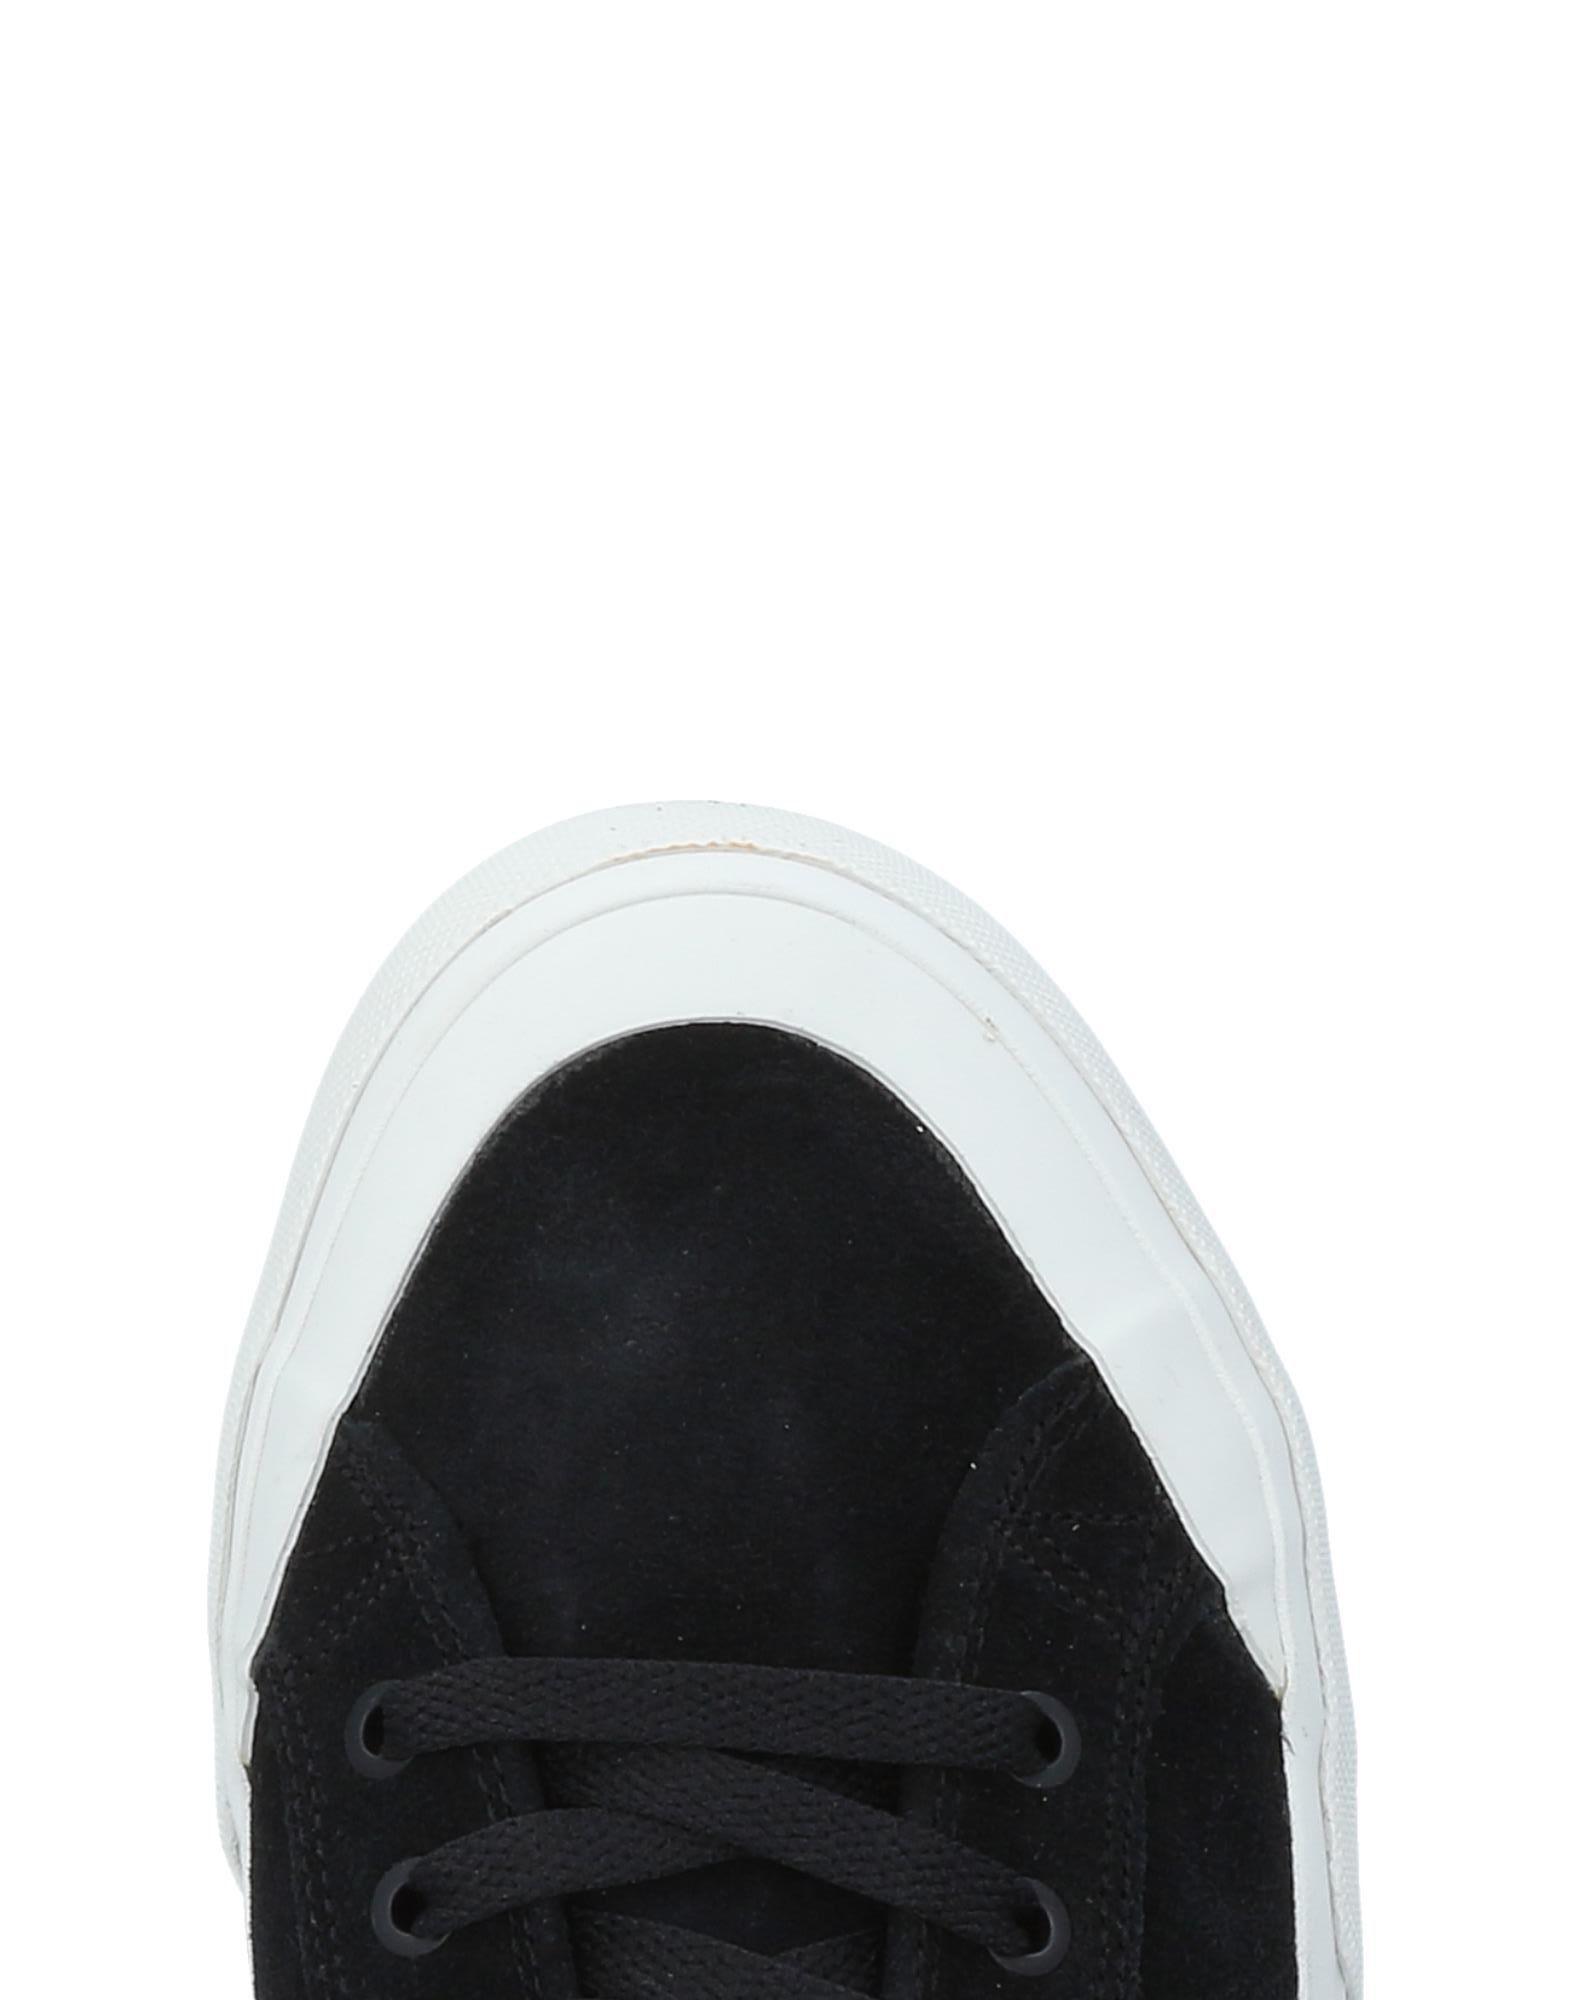 Rabatt echte 11476299RJ Schuhe Huf Sneakers Herren  11476299RJ echte 53e8bf